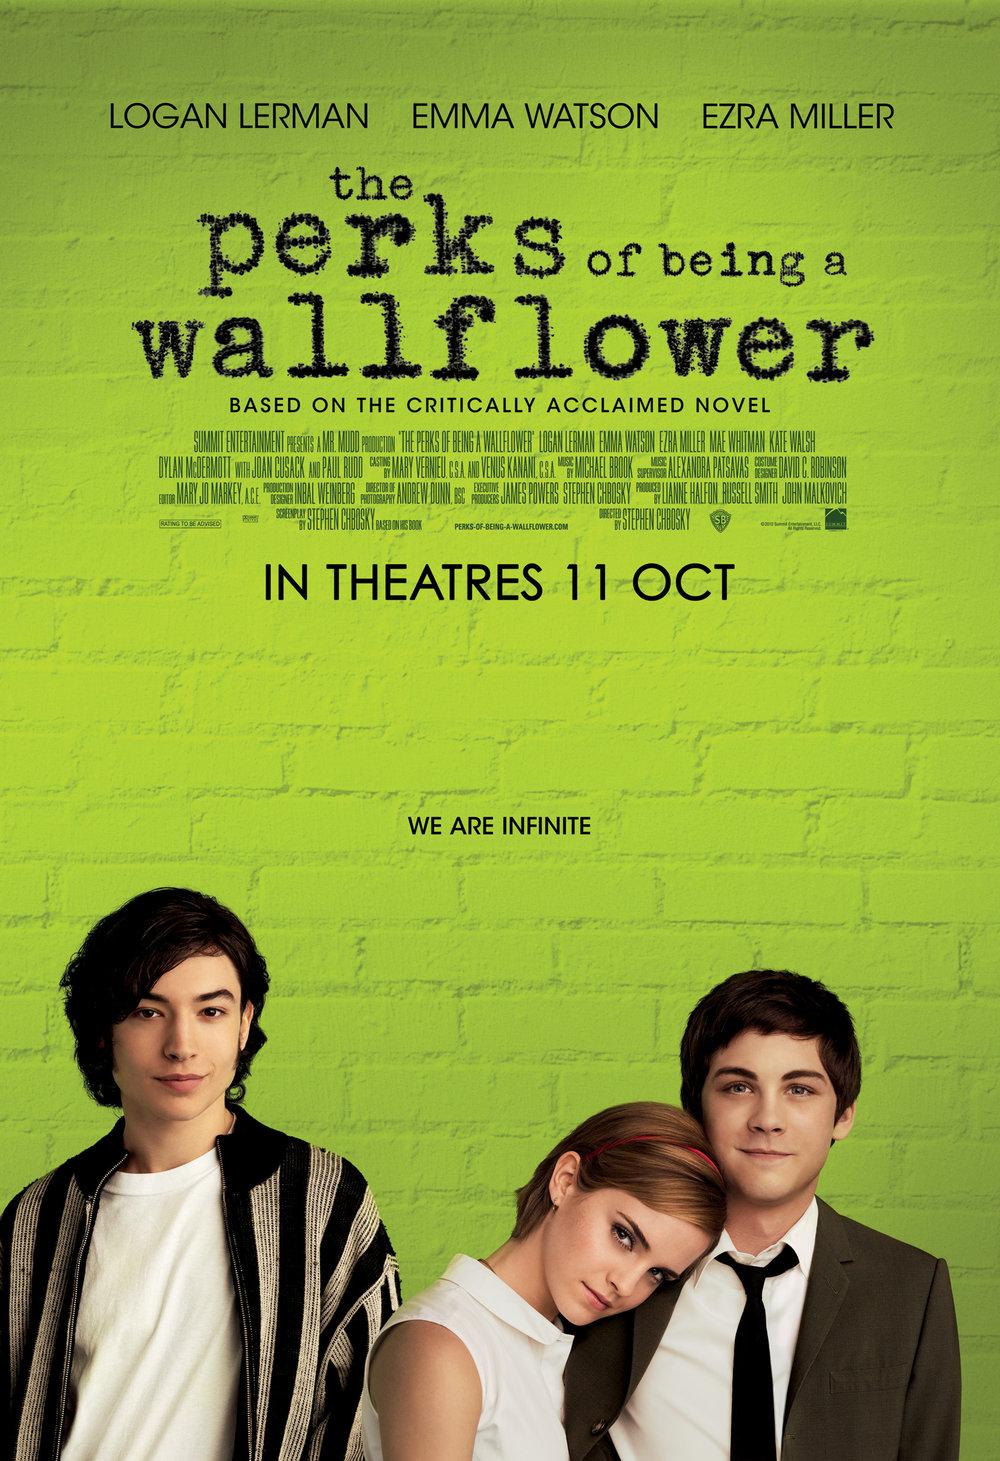 Perks-of-Being-a-Wallflower-A4-poster.jpg